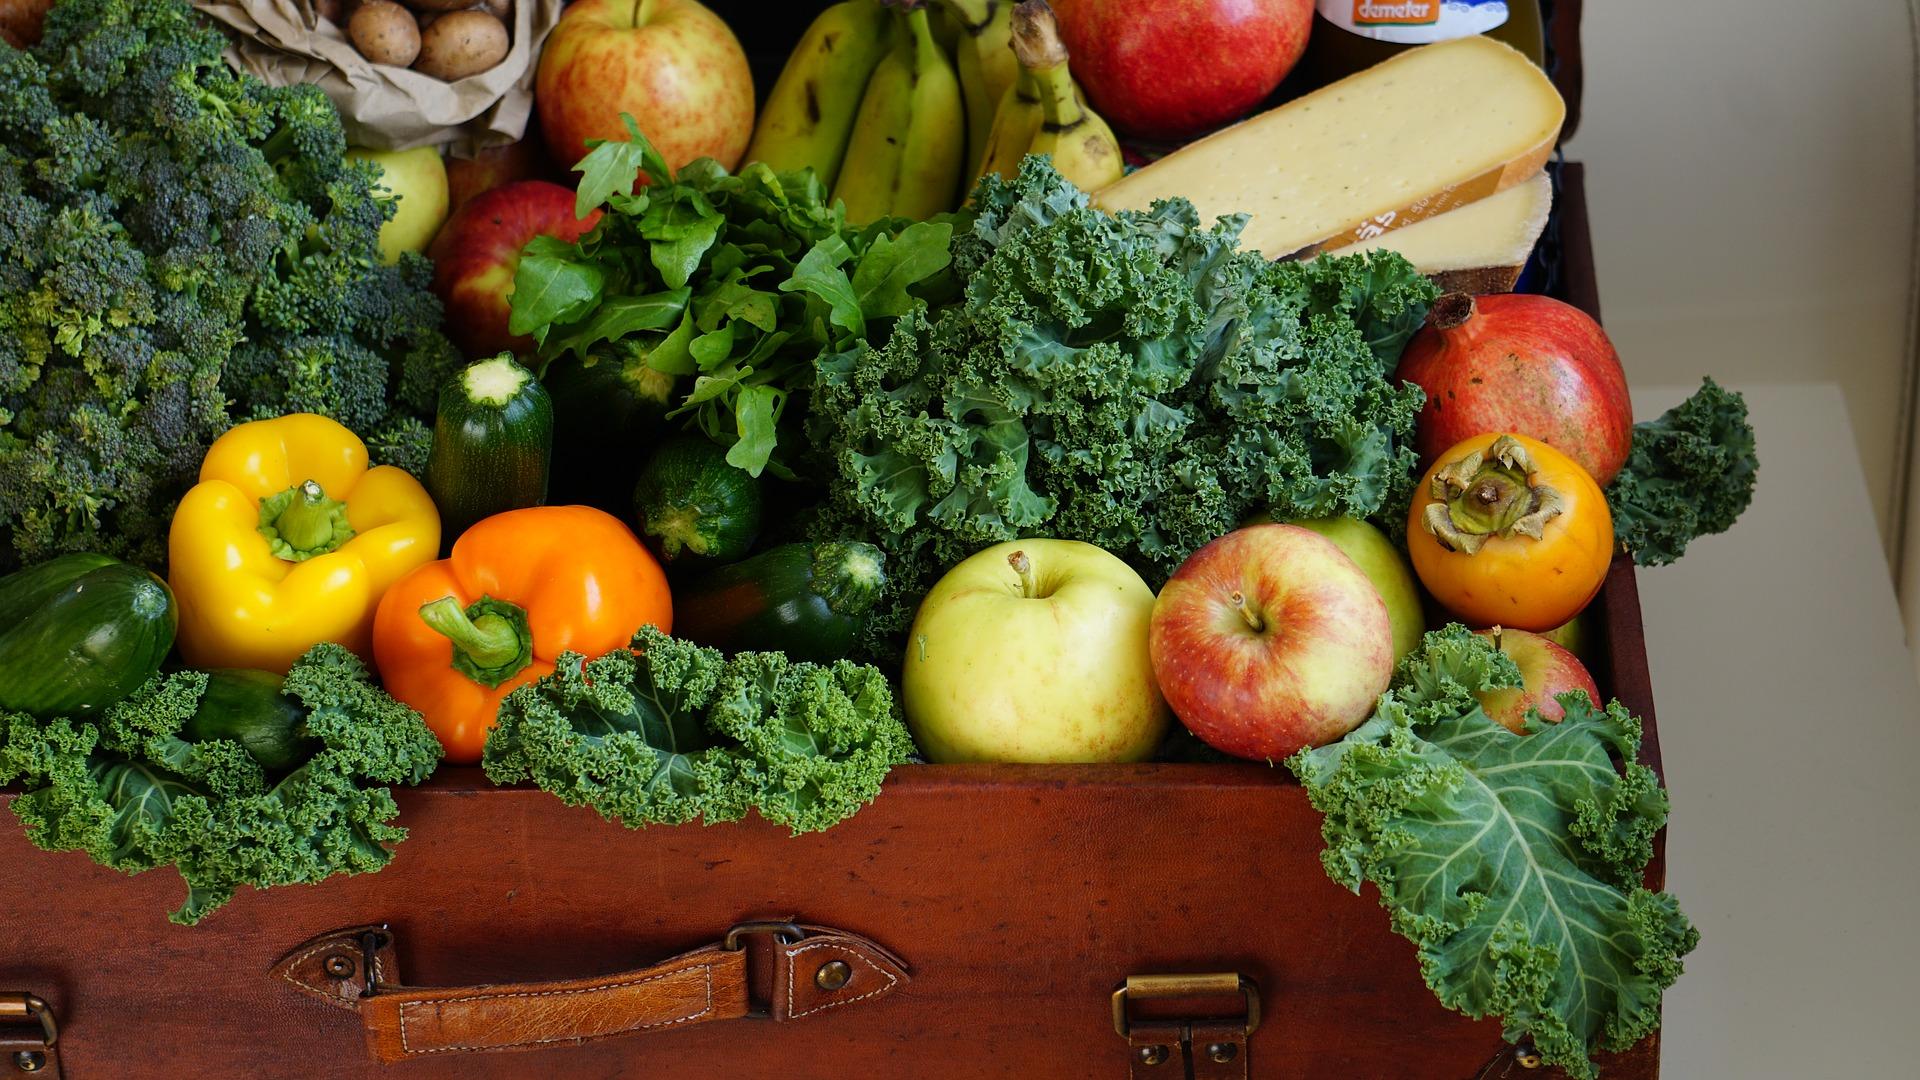 fruits-1761031_1920.jpg